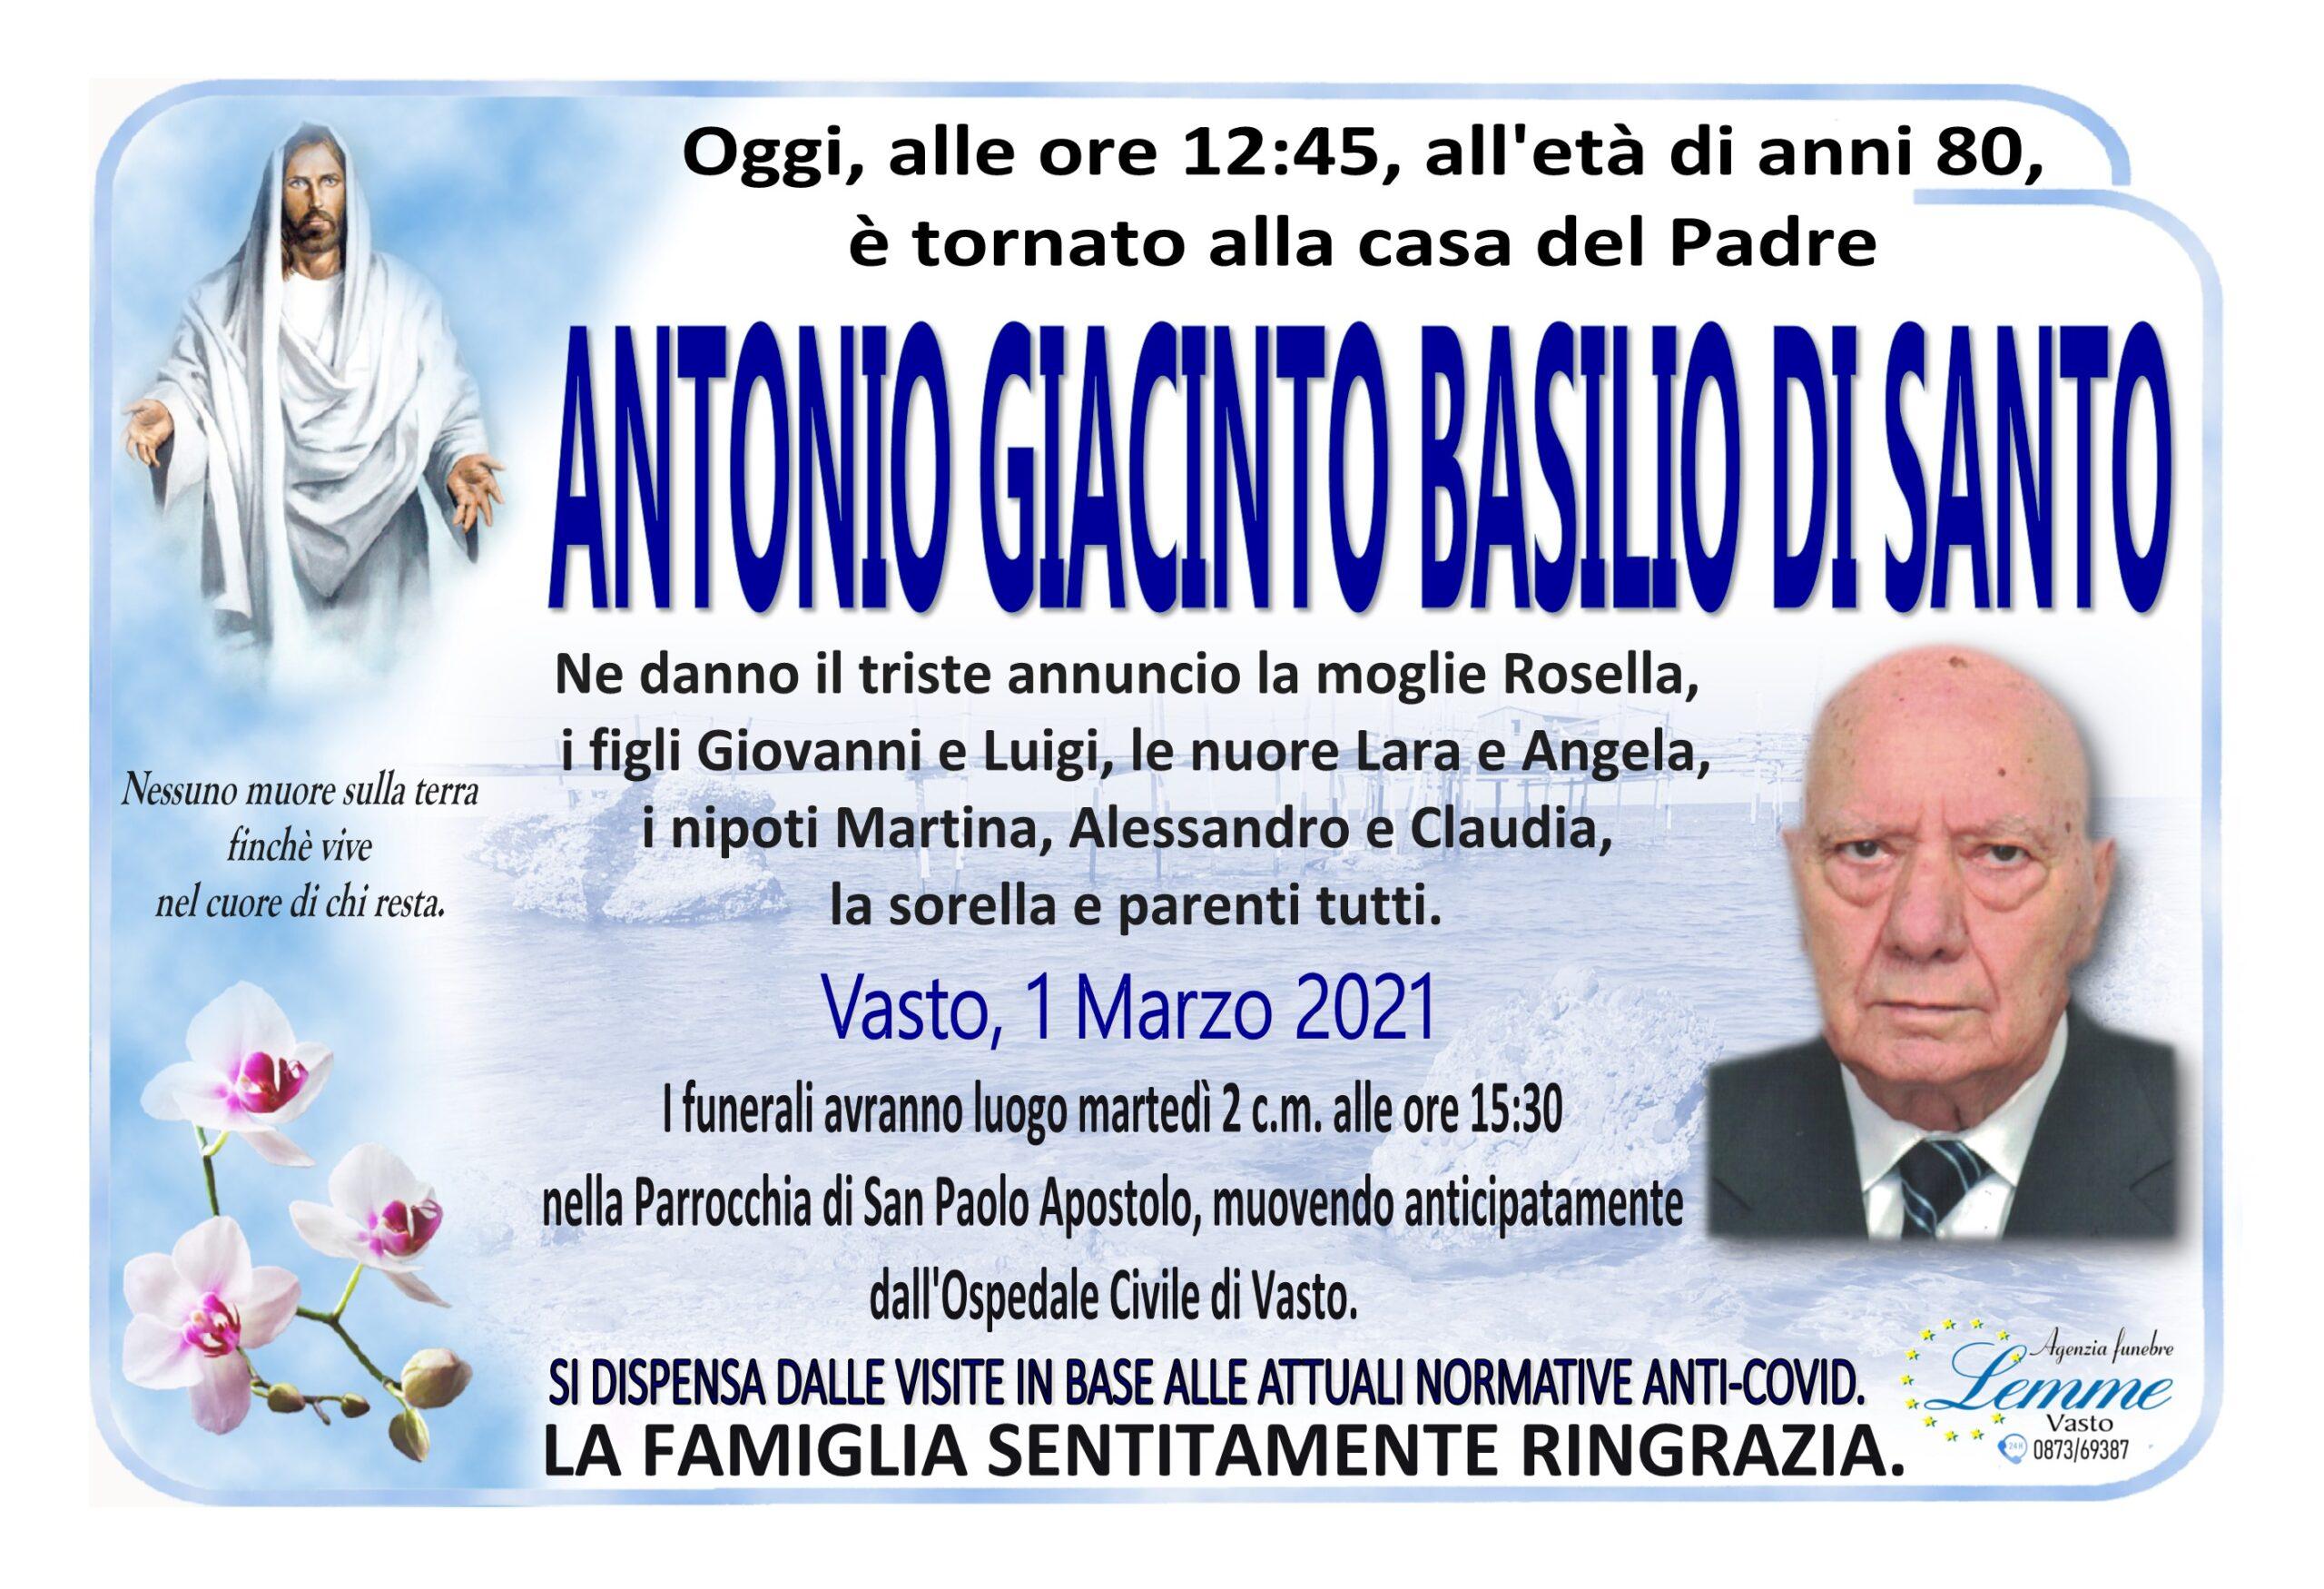 ANTONIO GIACINTO BASILIO DI SANTO